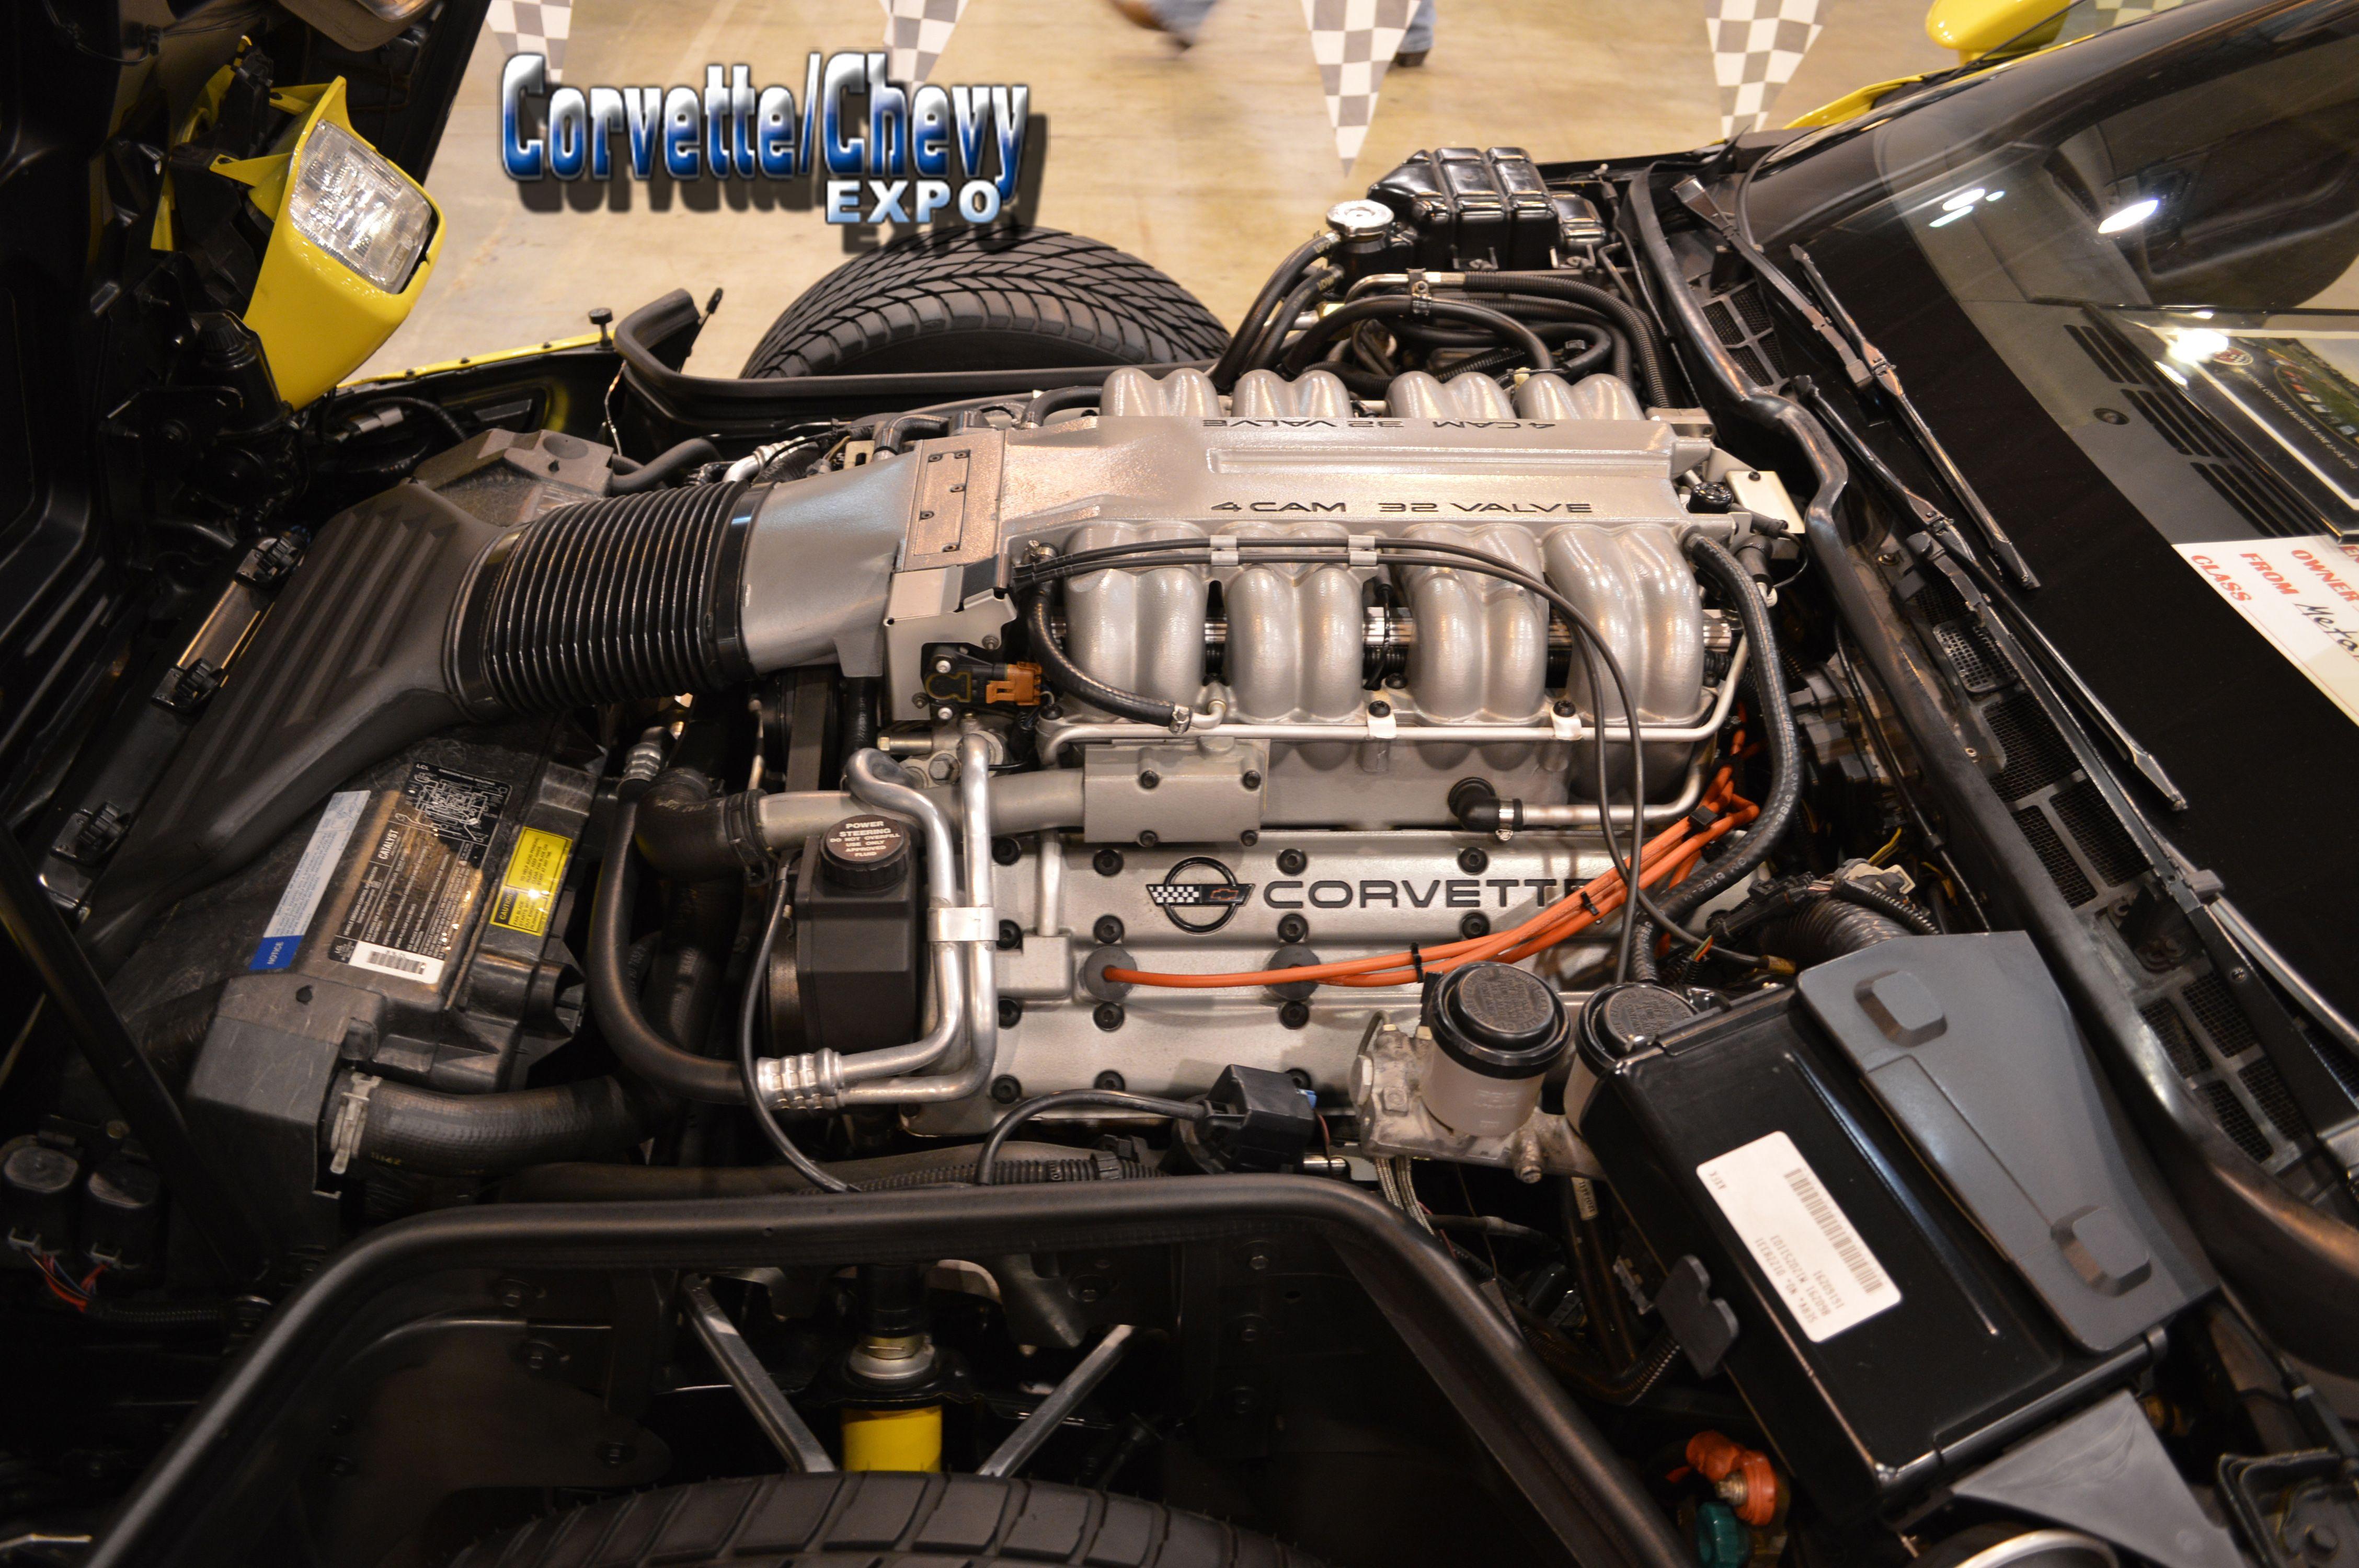 img auto dallas at chevrolet txgarage video on photos display the impala show